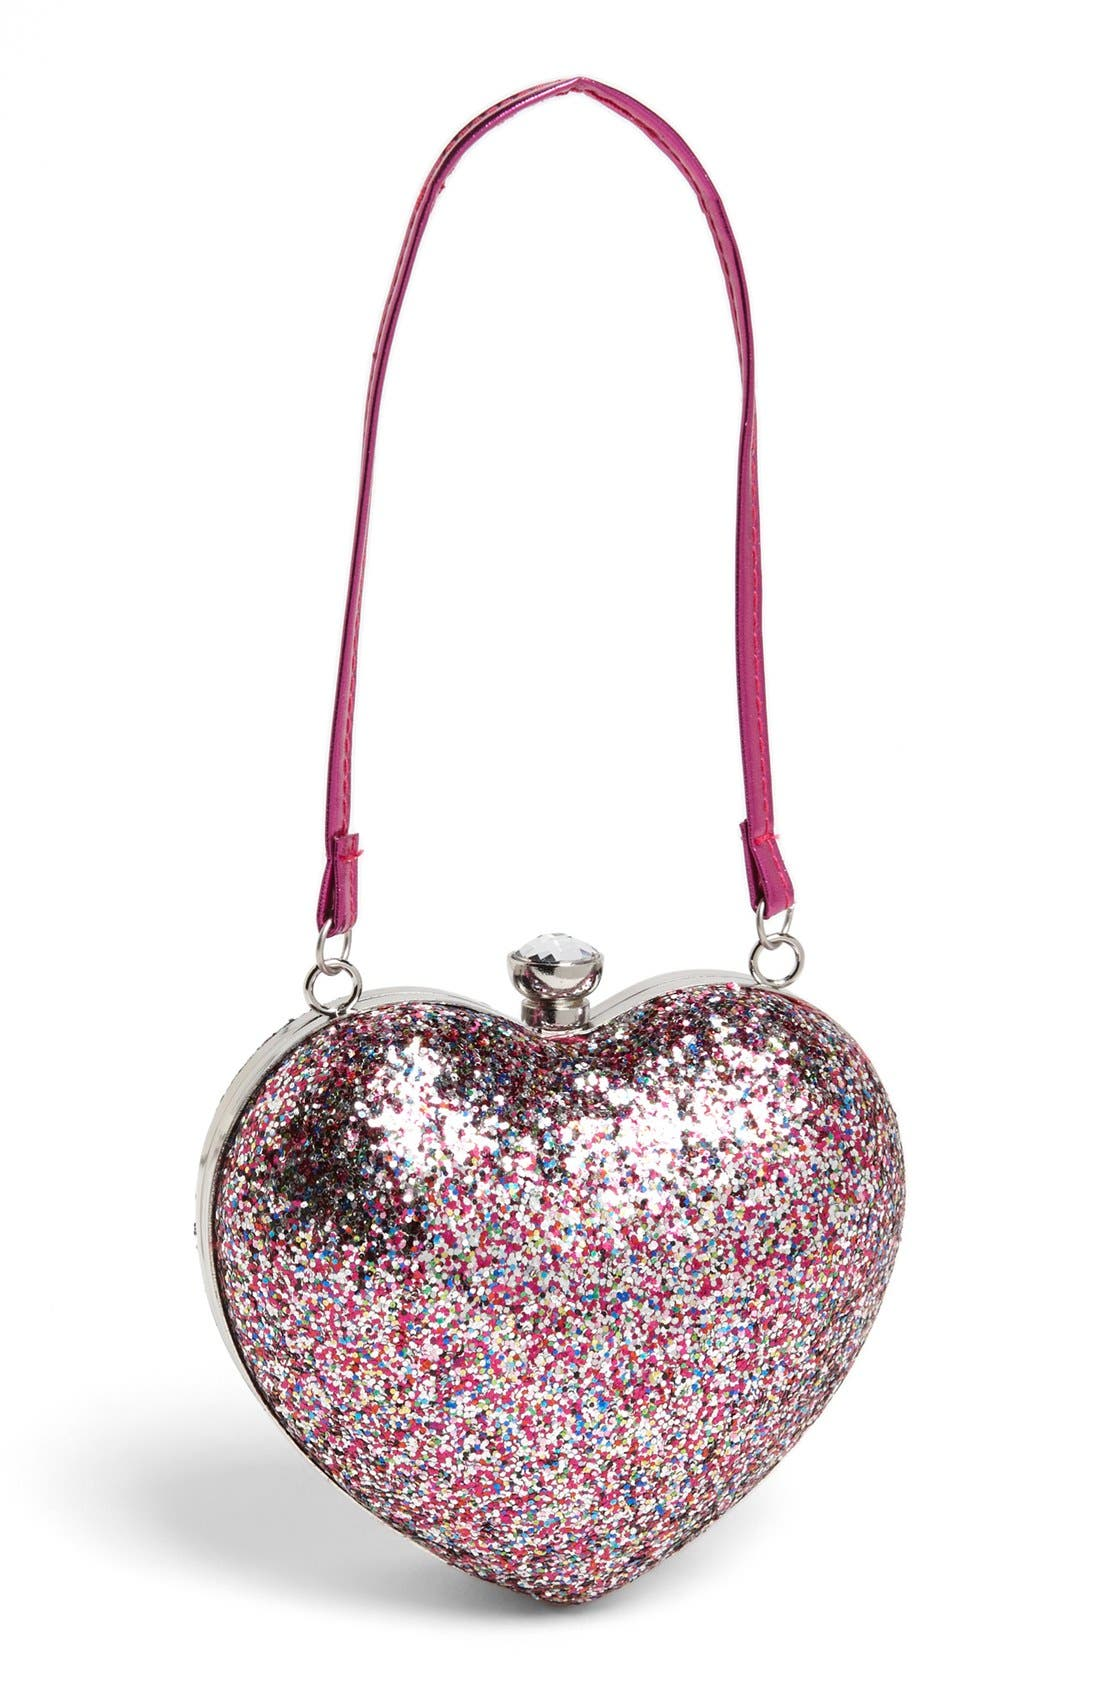 Capelli of New York Glitter Heart Shaped Handbag,                             Main thumbnail 1, color,                             975